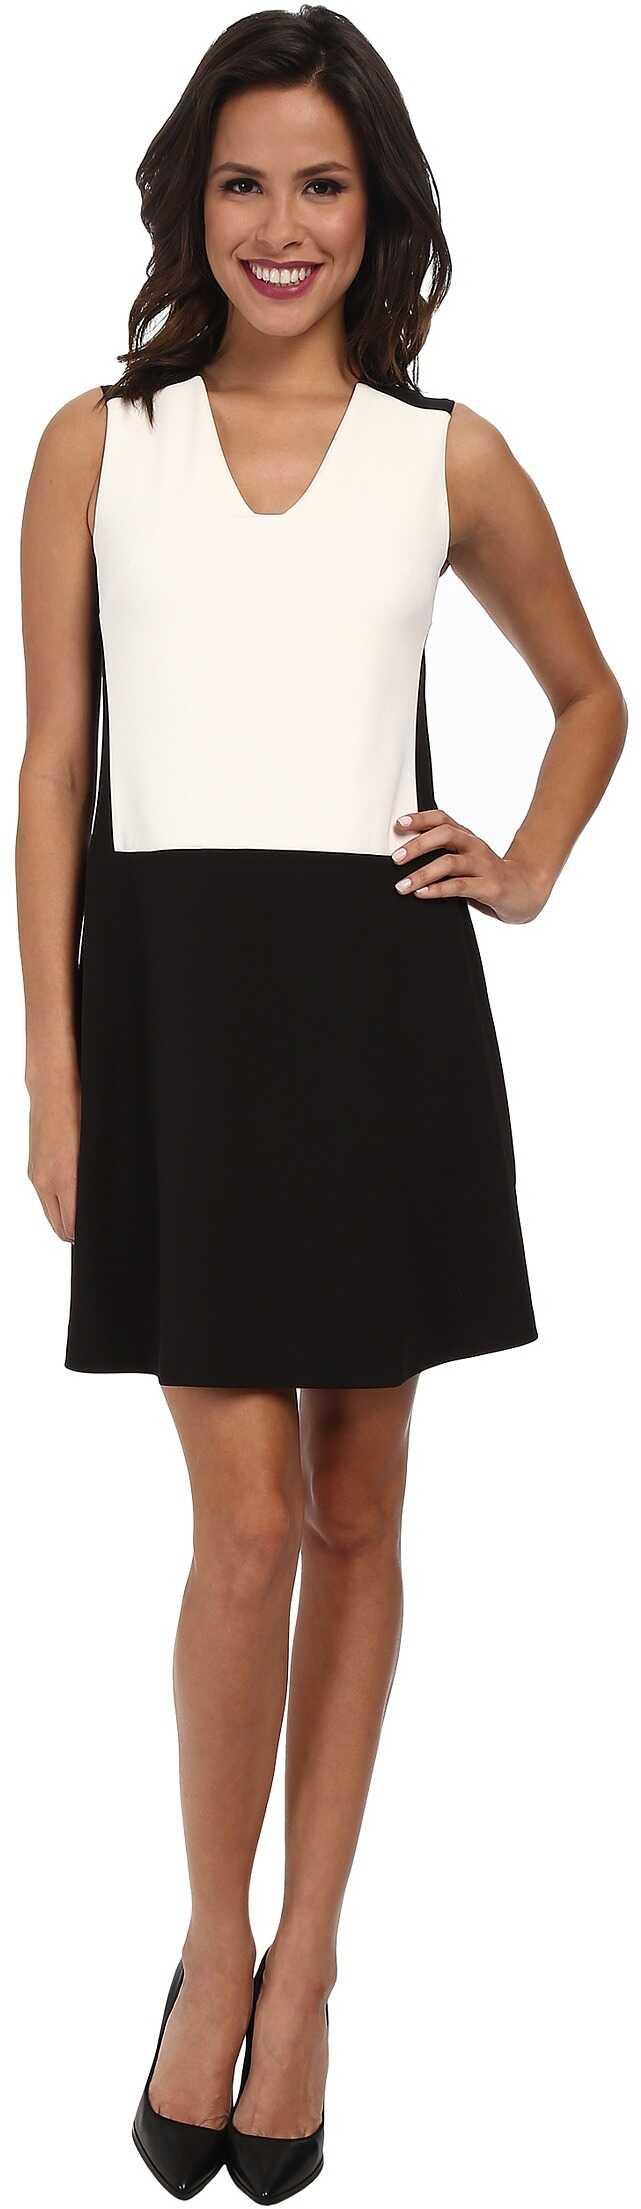 NYDJ Sabrina Shift Dress* Black/Optic White